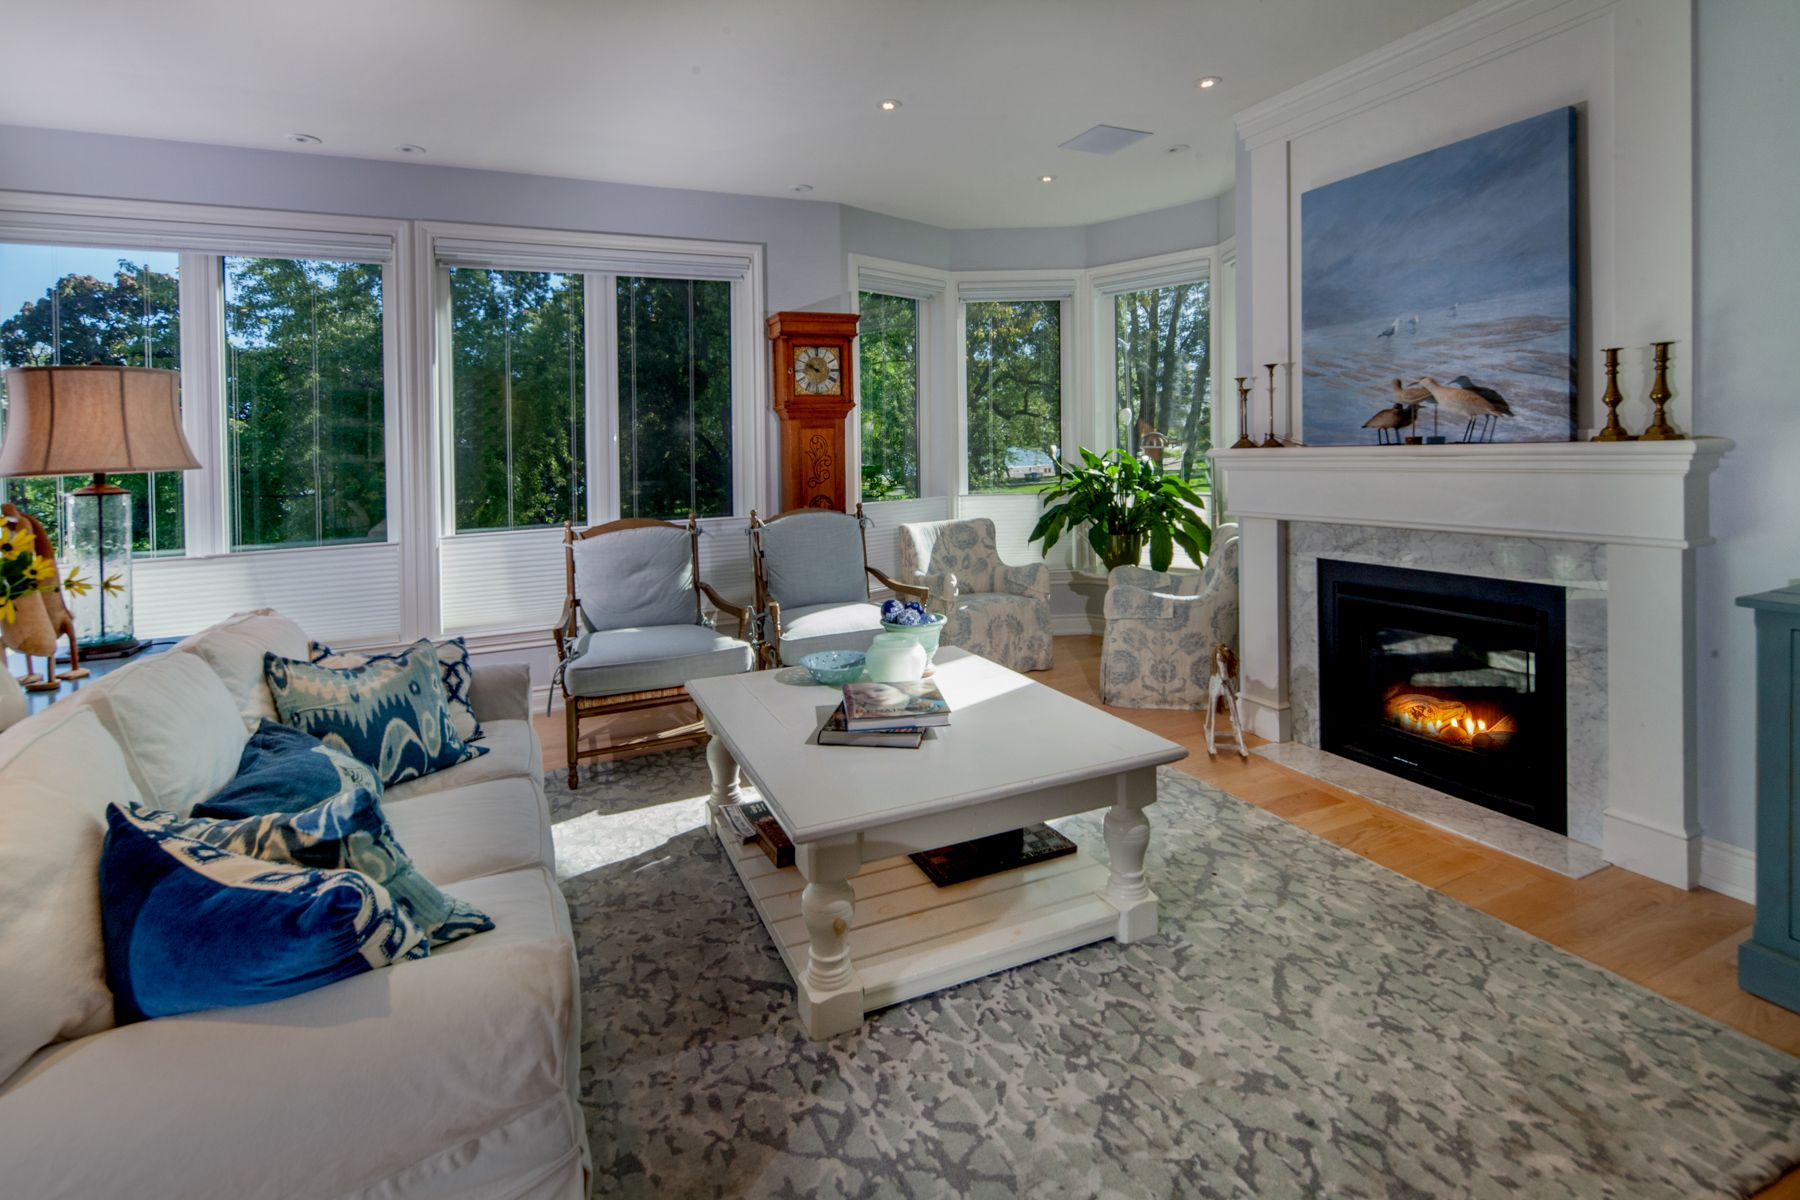 kewbeachouse upper unit living room